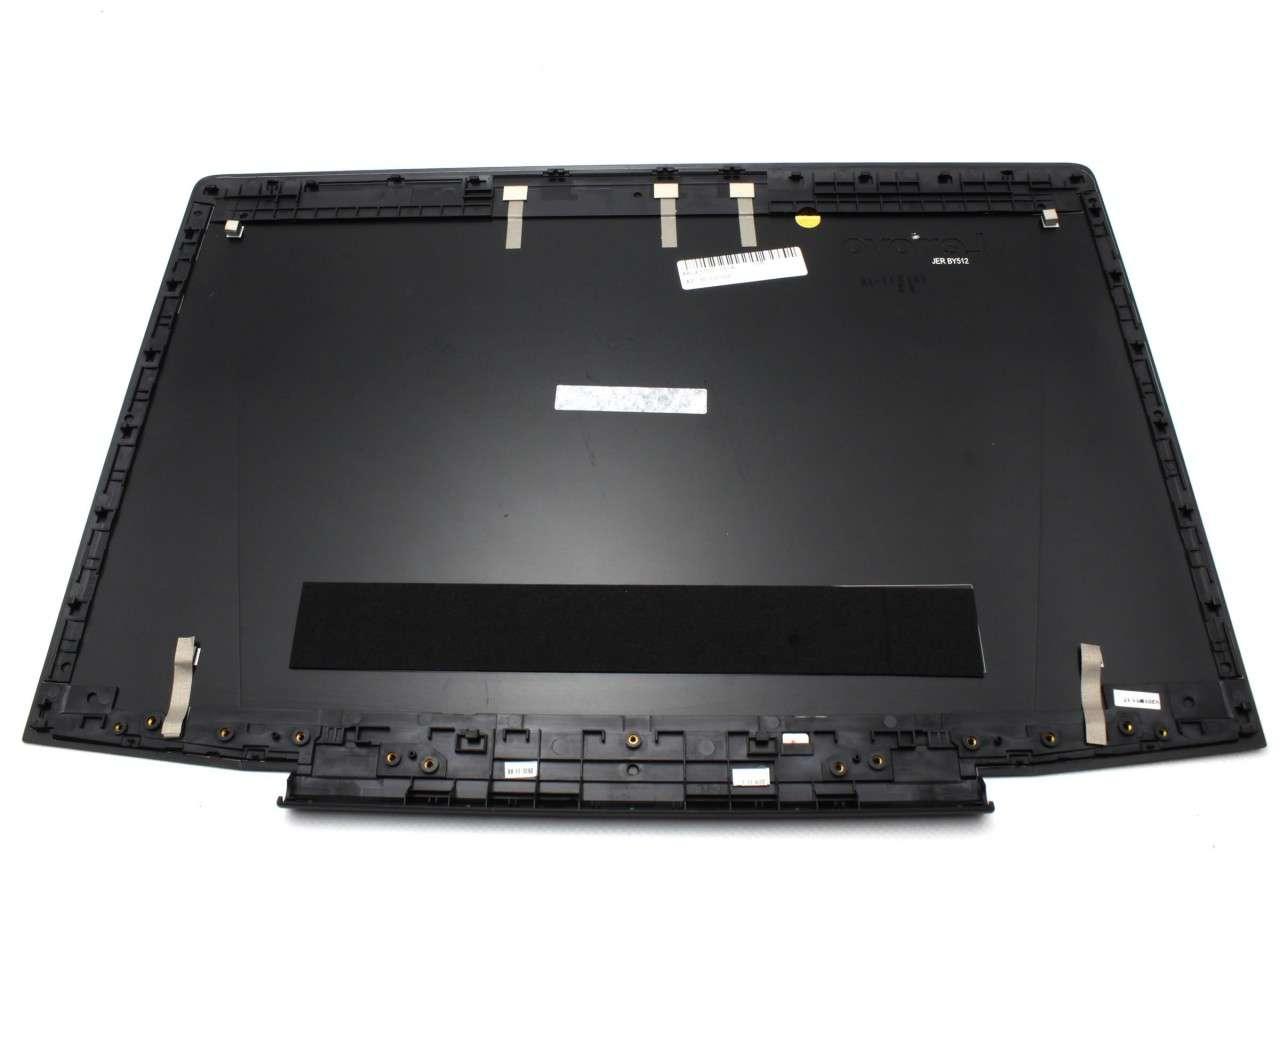 Capac Display BackCover Lenovo IdeaPad Y700-15ACZ Carcasa Display cu Versiune Camera 3D imagine powerlaptop.ro 2021